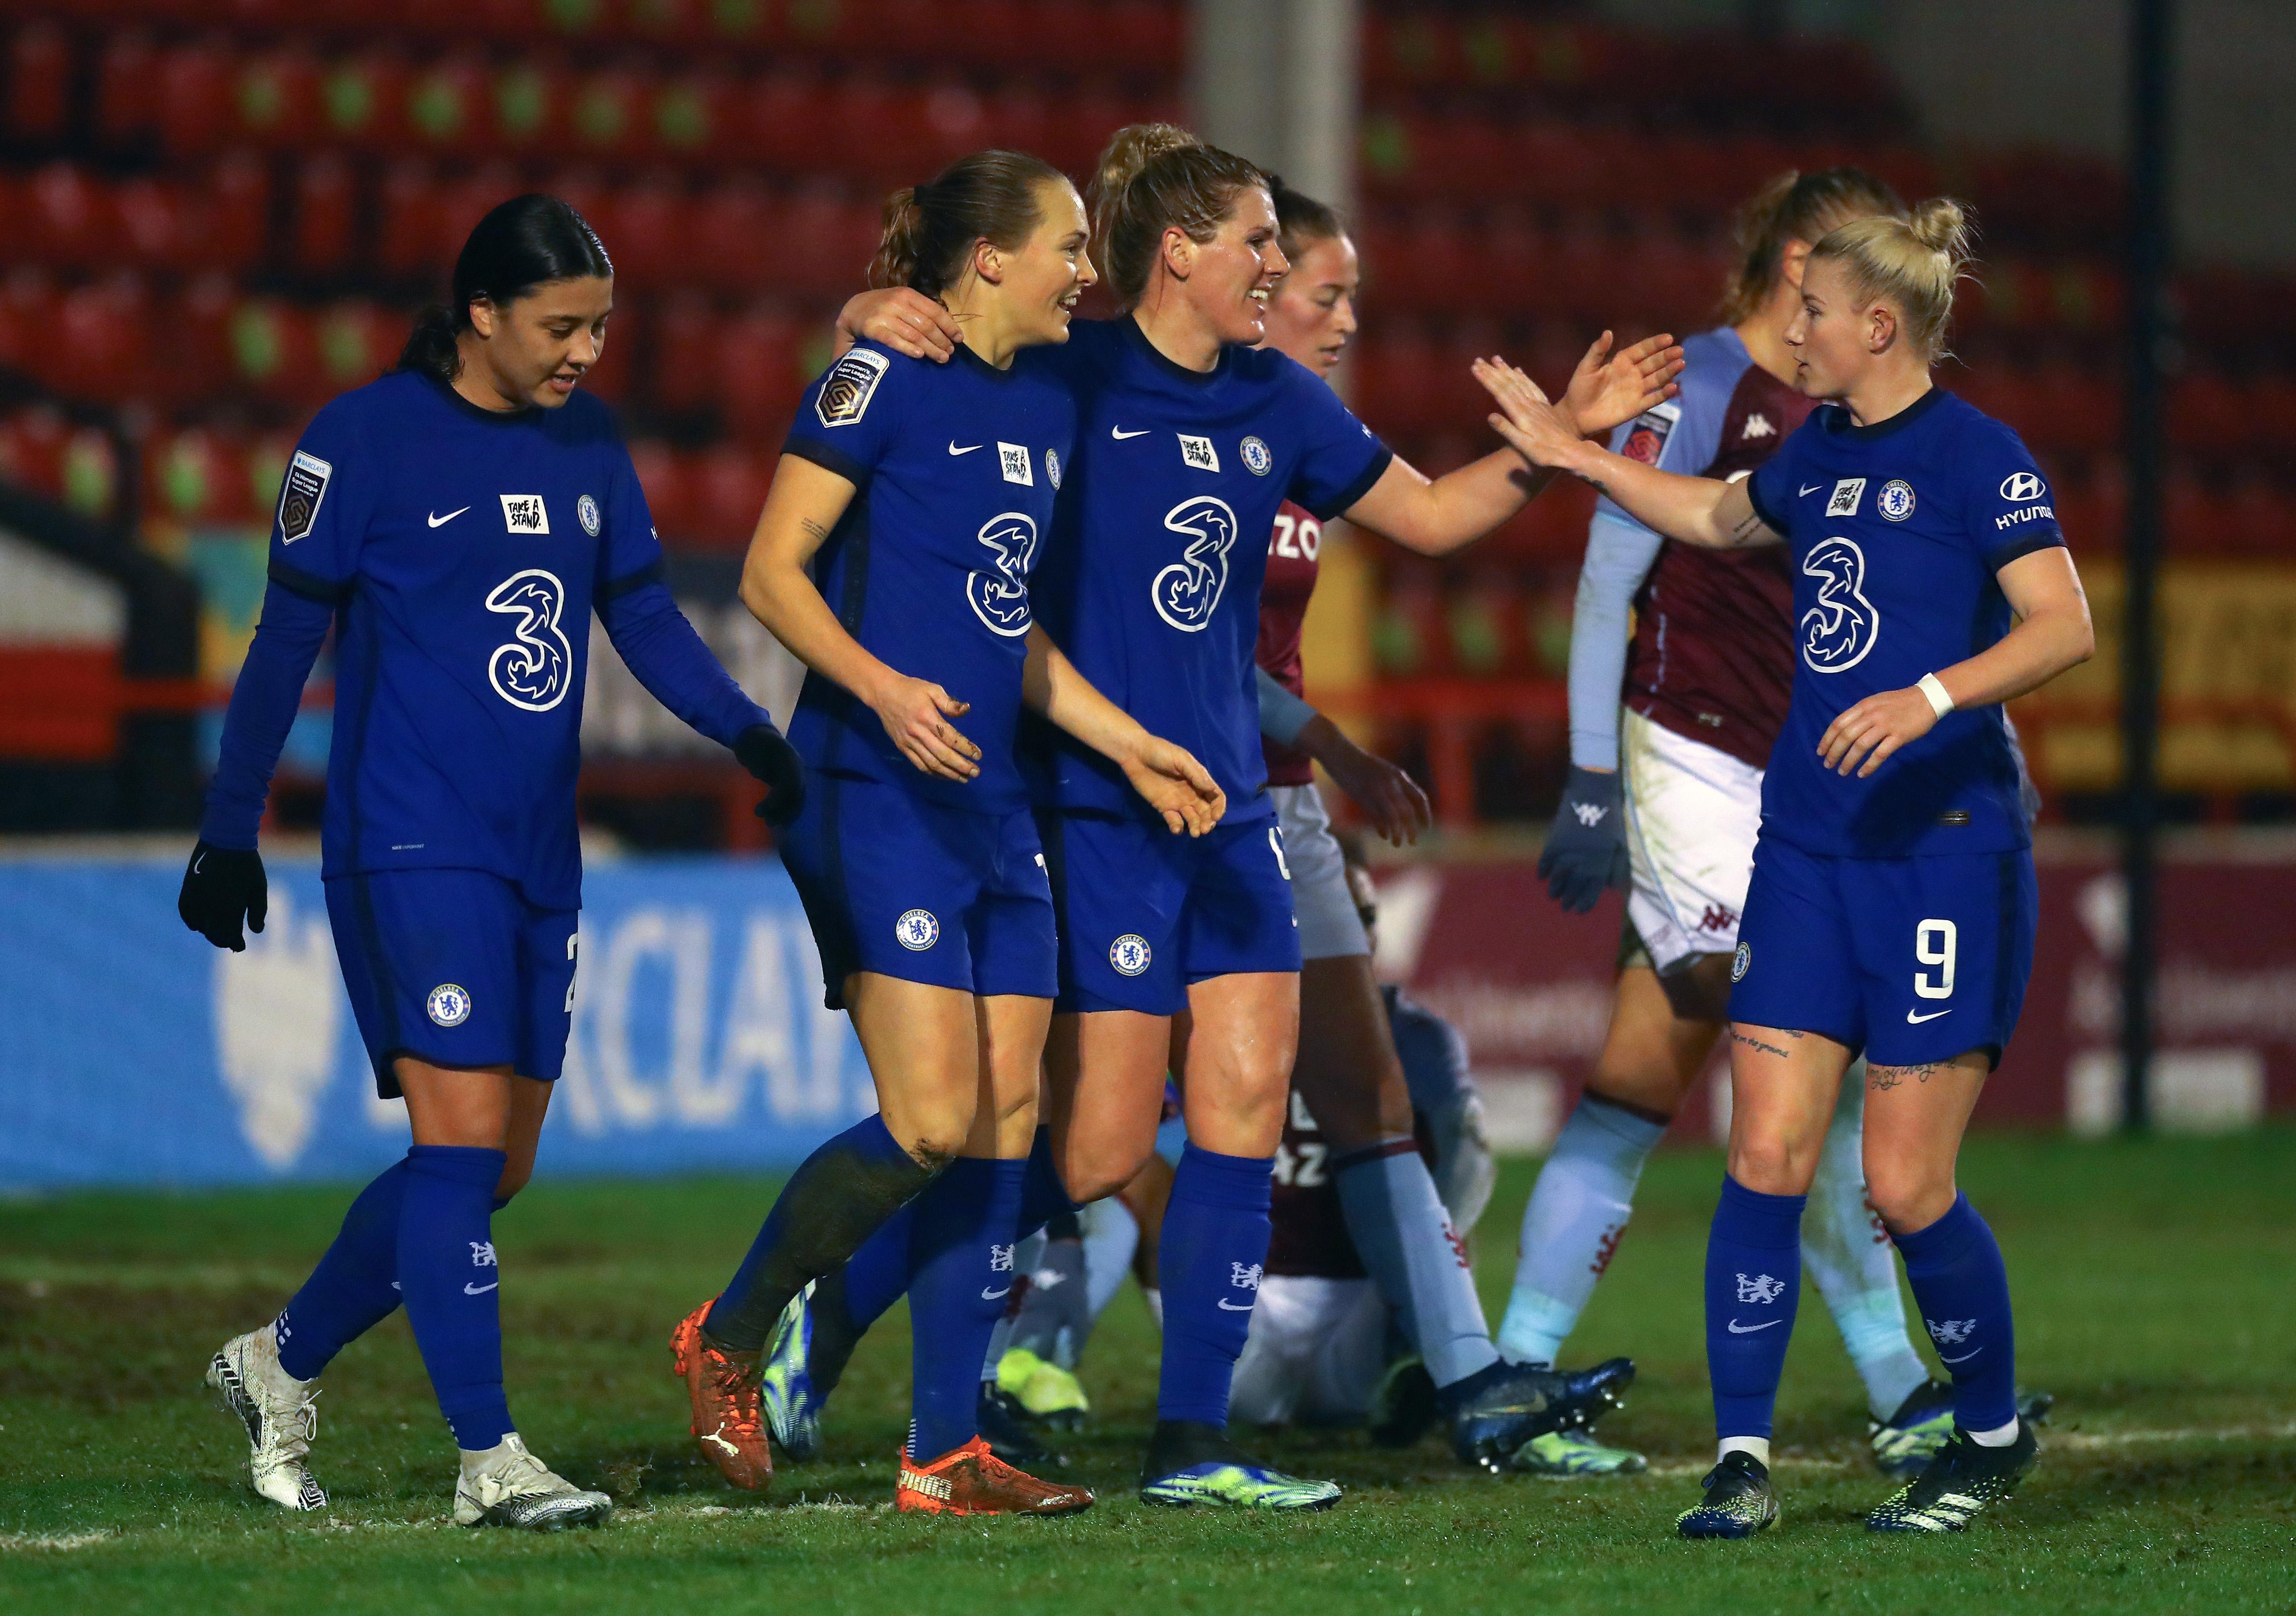 Aston Villa女士v Chelsea女性 - 巴克莱法妇女超级联赛